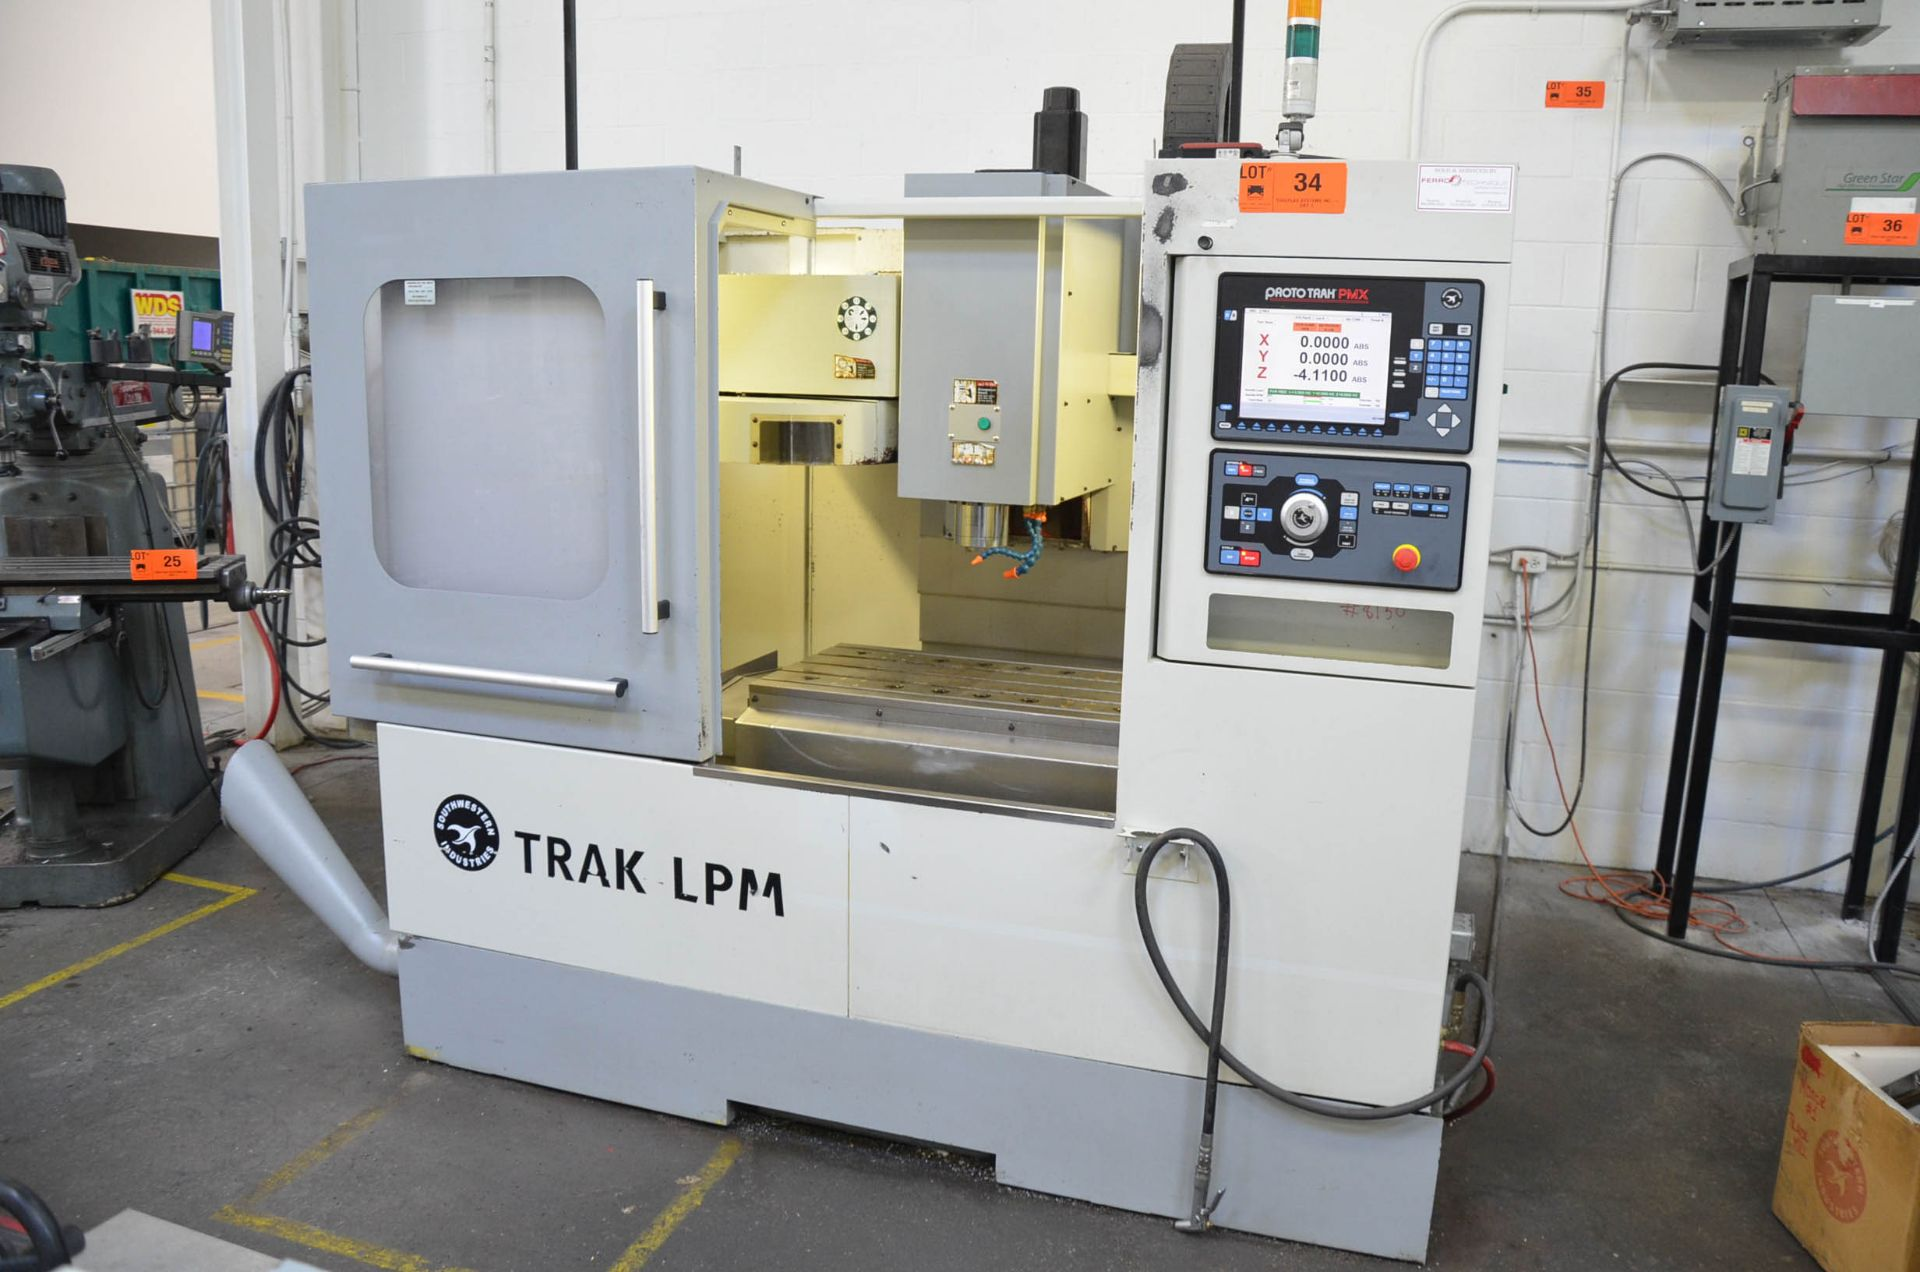 "SWI (2014) TRAK LPM CNC VERTICAL MACHINING CENTER WITH PROTO TRAK PMX CNC CONTROL, 19.5"" X 35.5"" - Image 2 of 9"